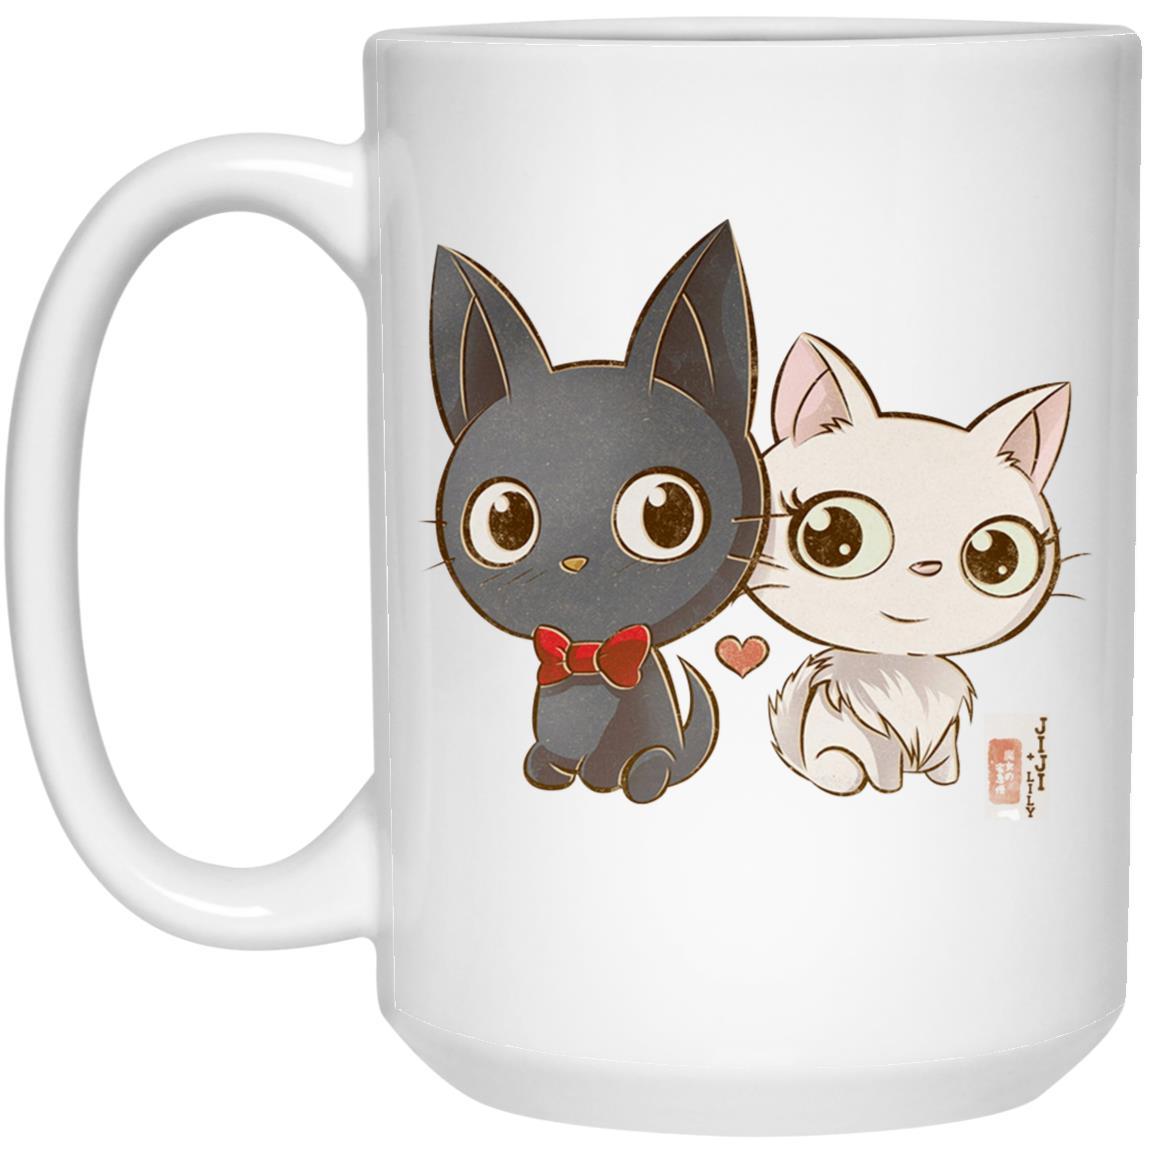 Kiki's Delivery Service – Jiji and Lily Chibi  Mug